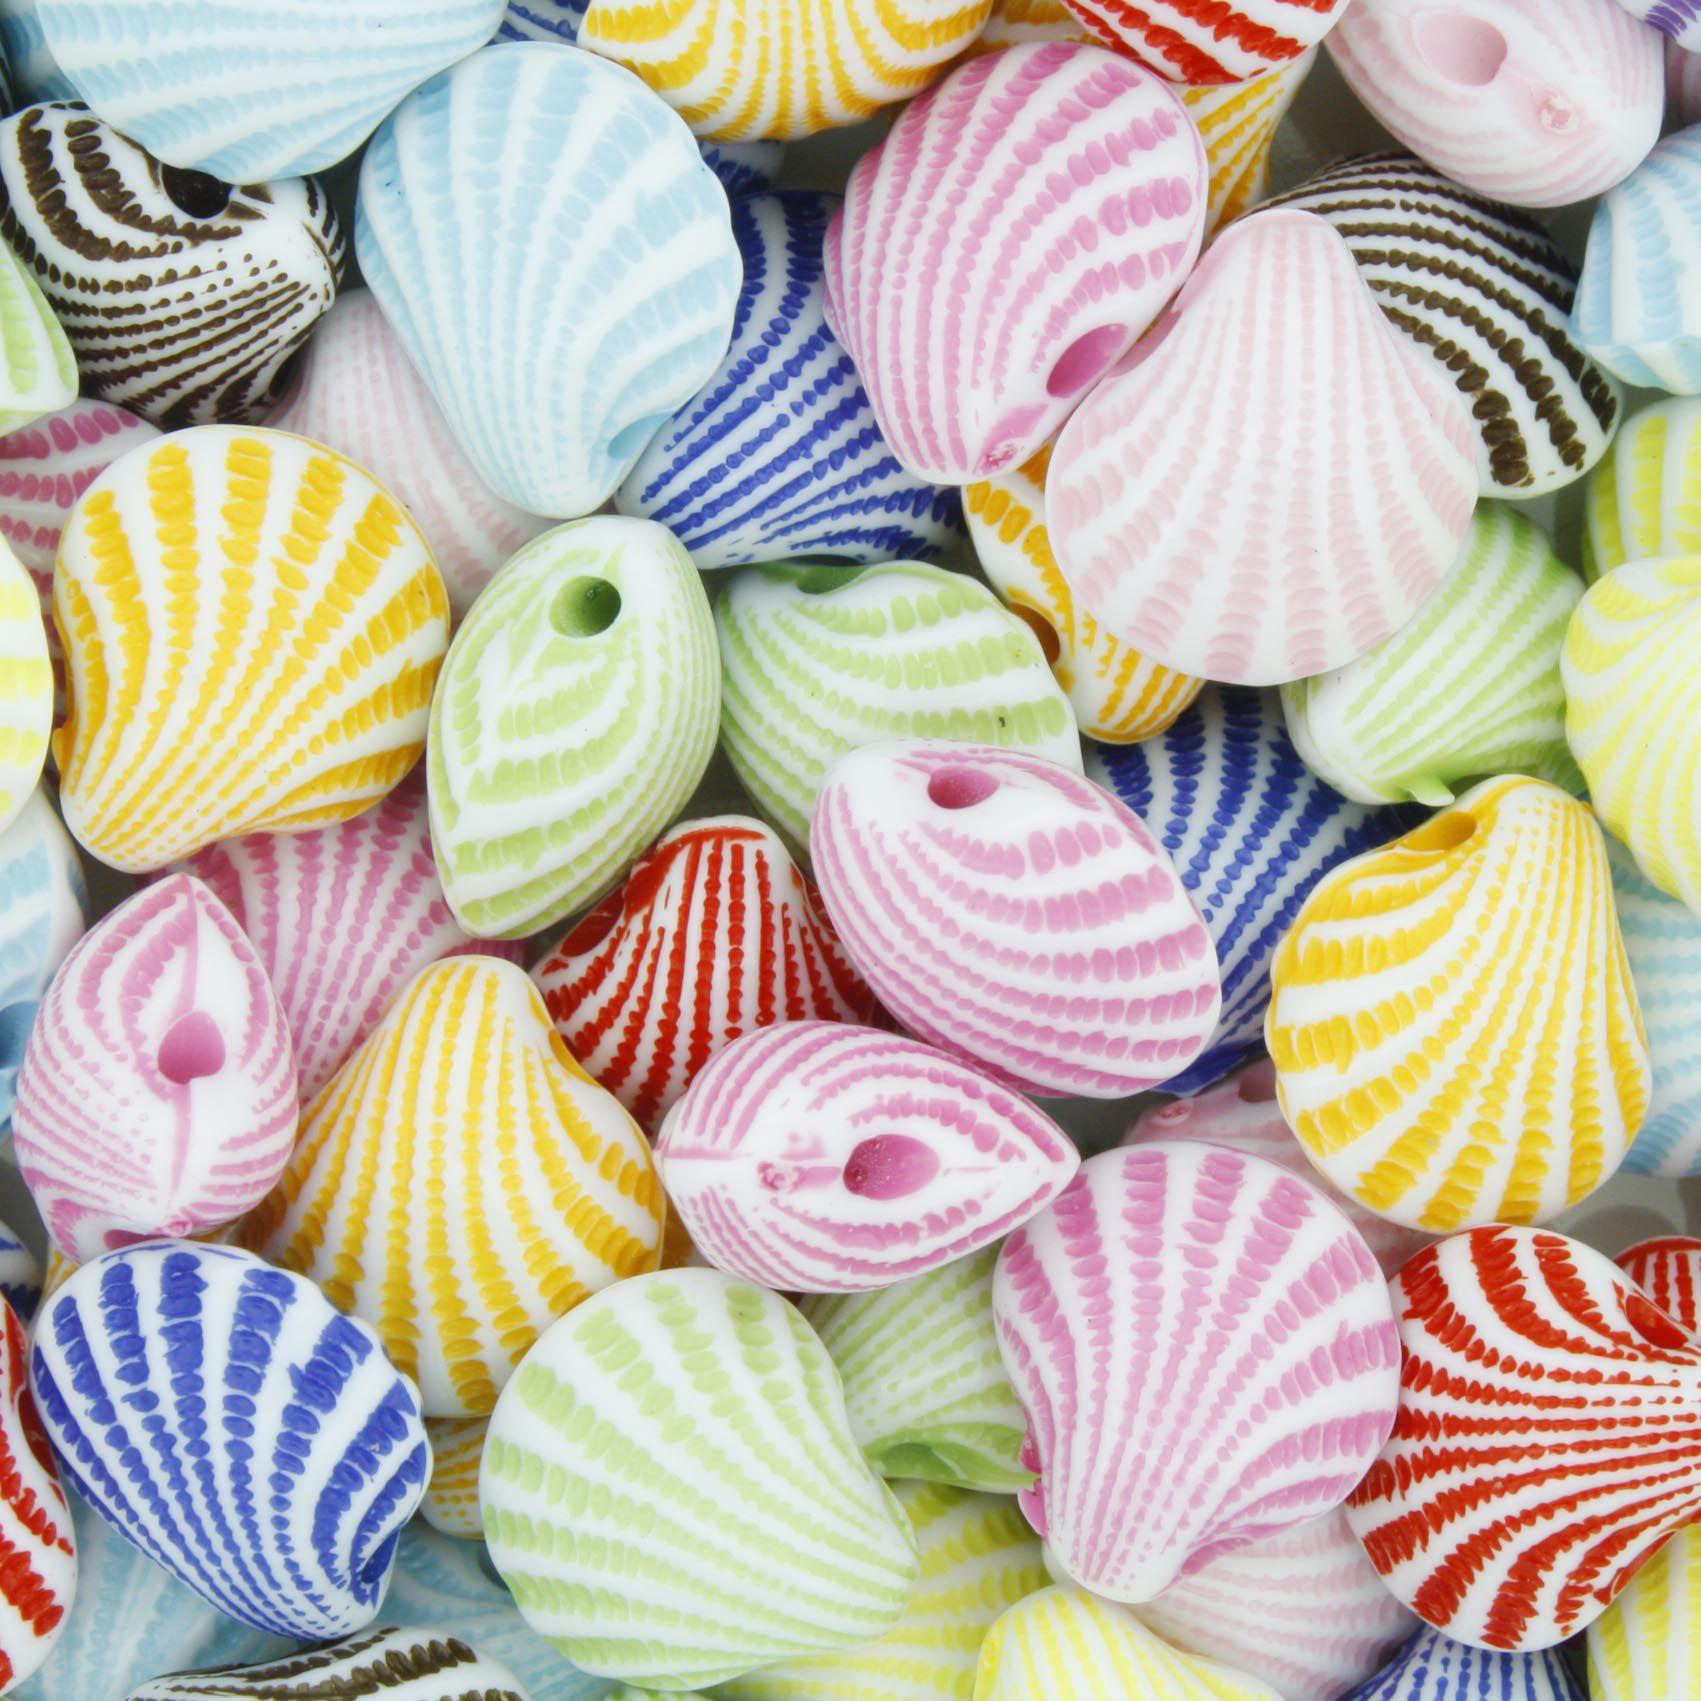 Miçanga Colorida / Infantil - Conchas  - Stéphanie Bijoux® - Peças para Bijuterias e Artesanato